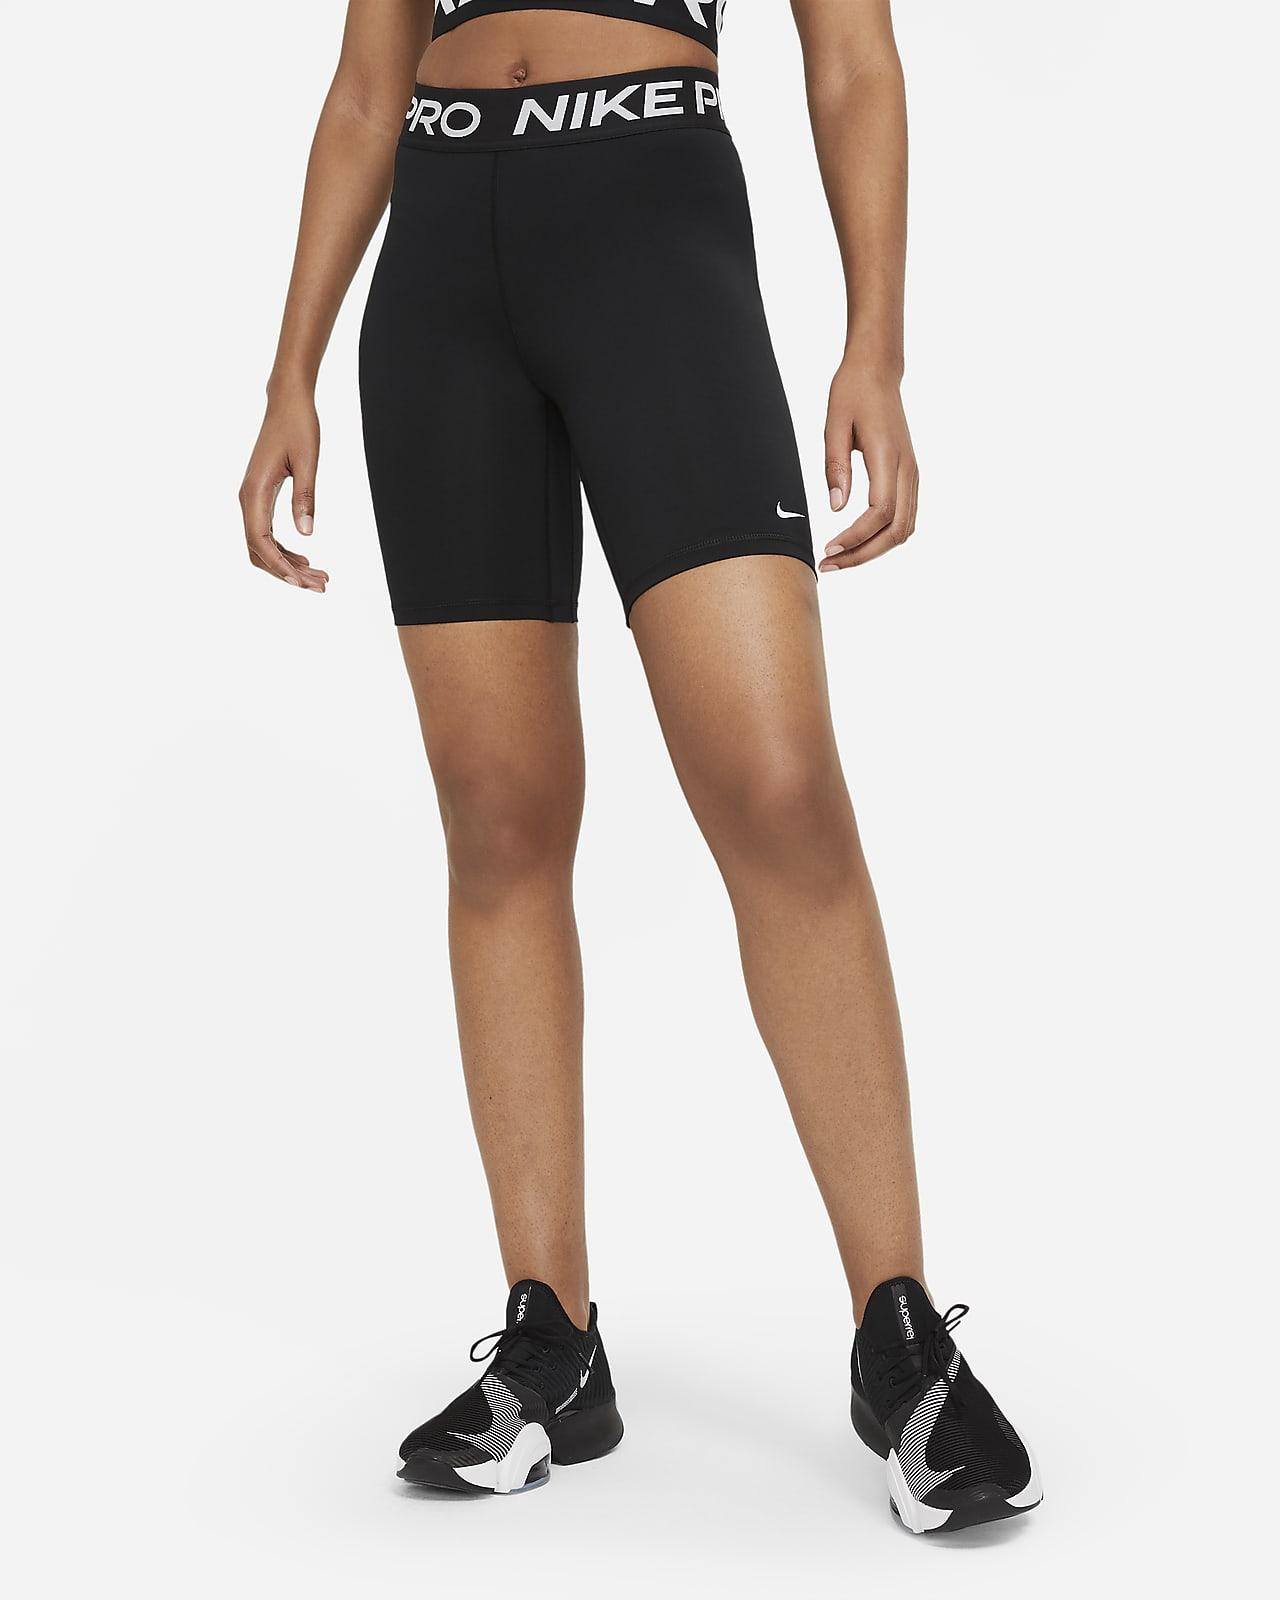 Shorts de 20 cm para mujer Nike Pro 365